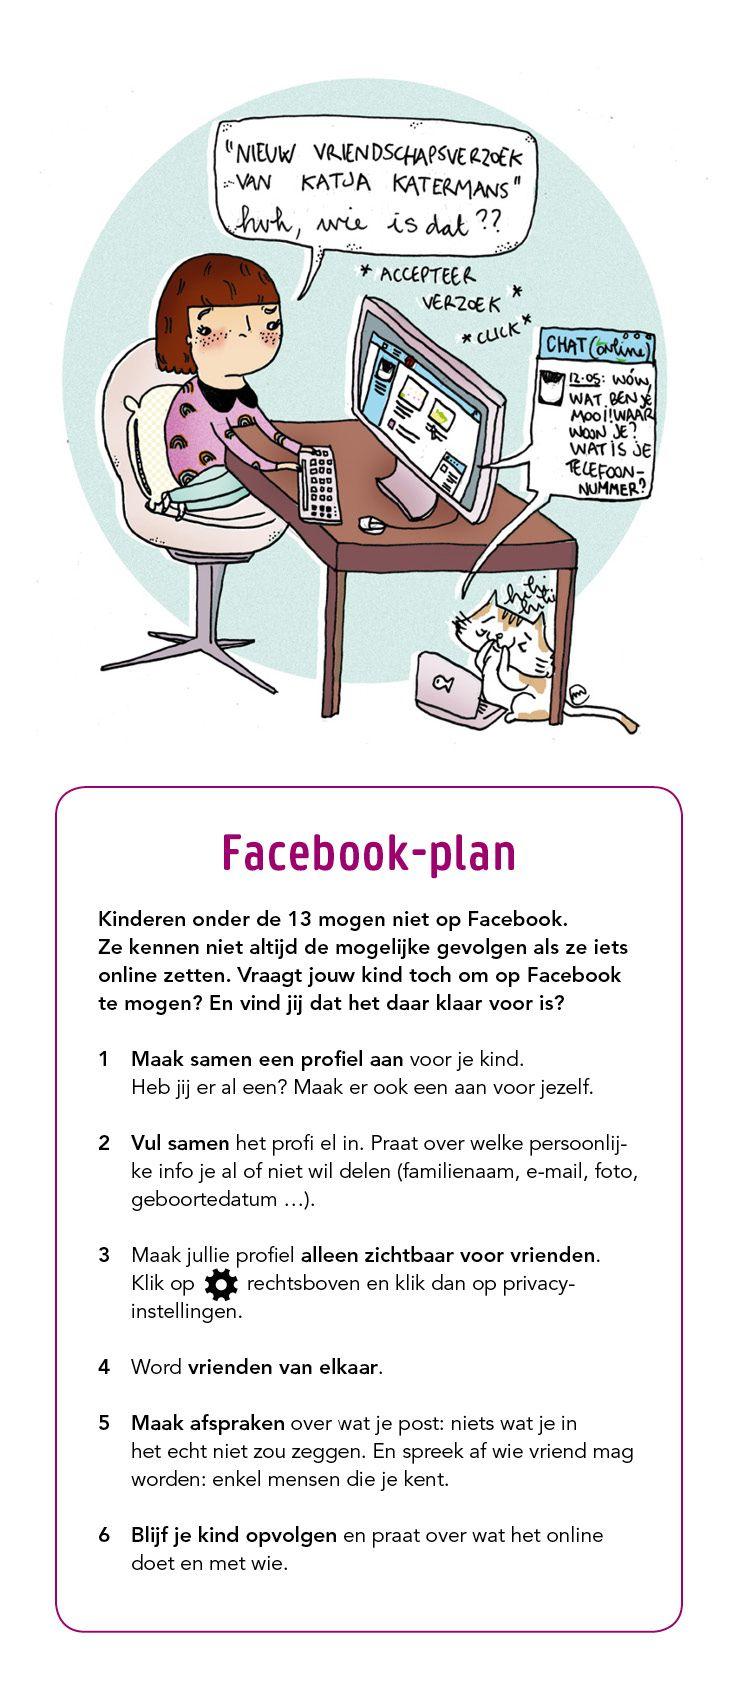 Facebook-plan